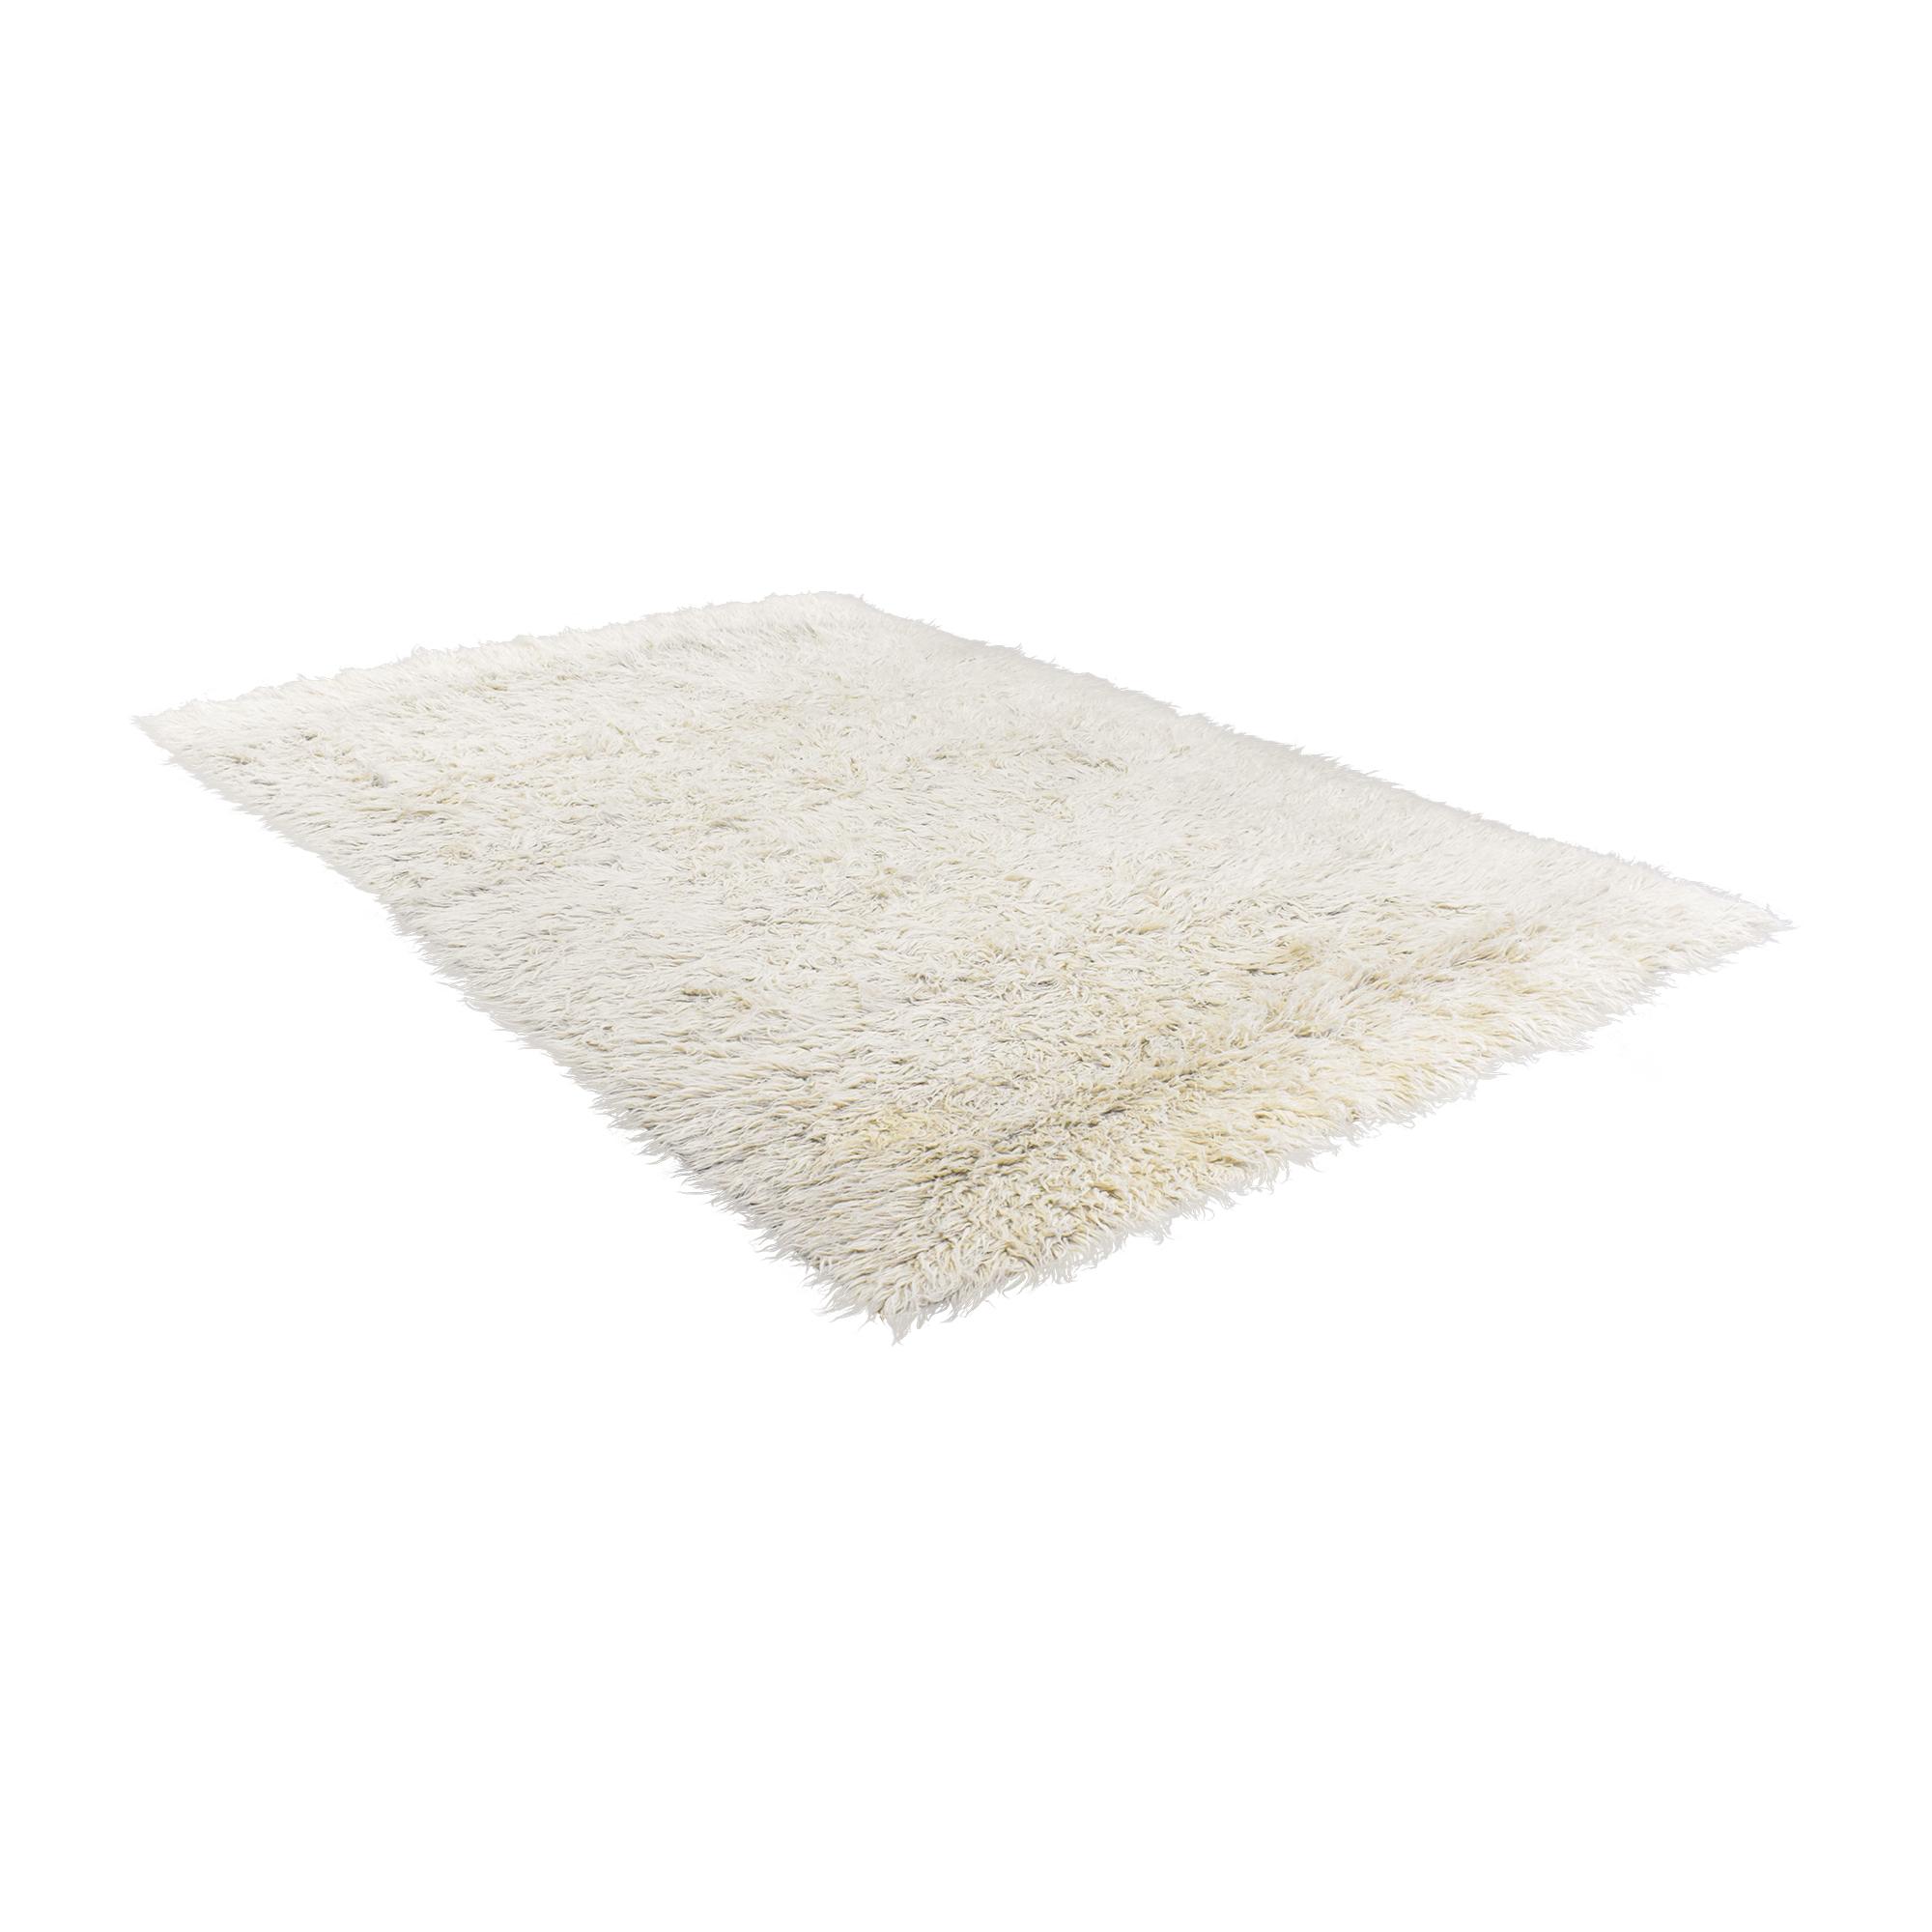 ABC Carpet & Home ABC Carpet & Home Shag Area Rug ma